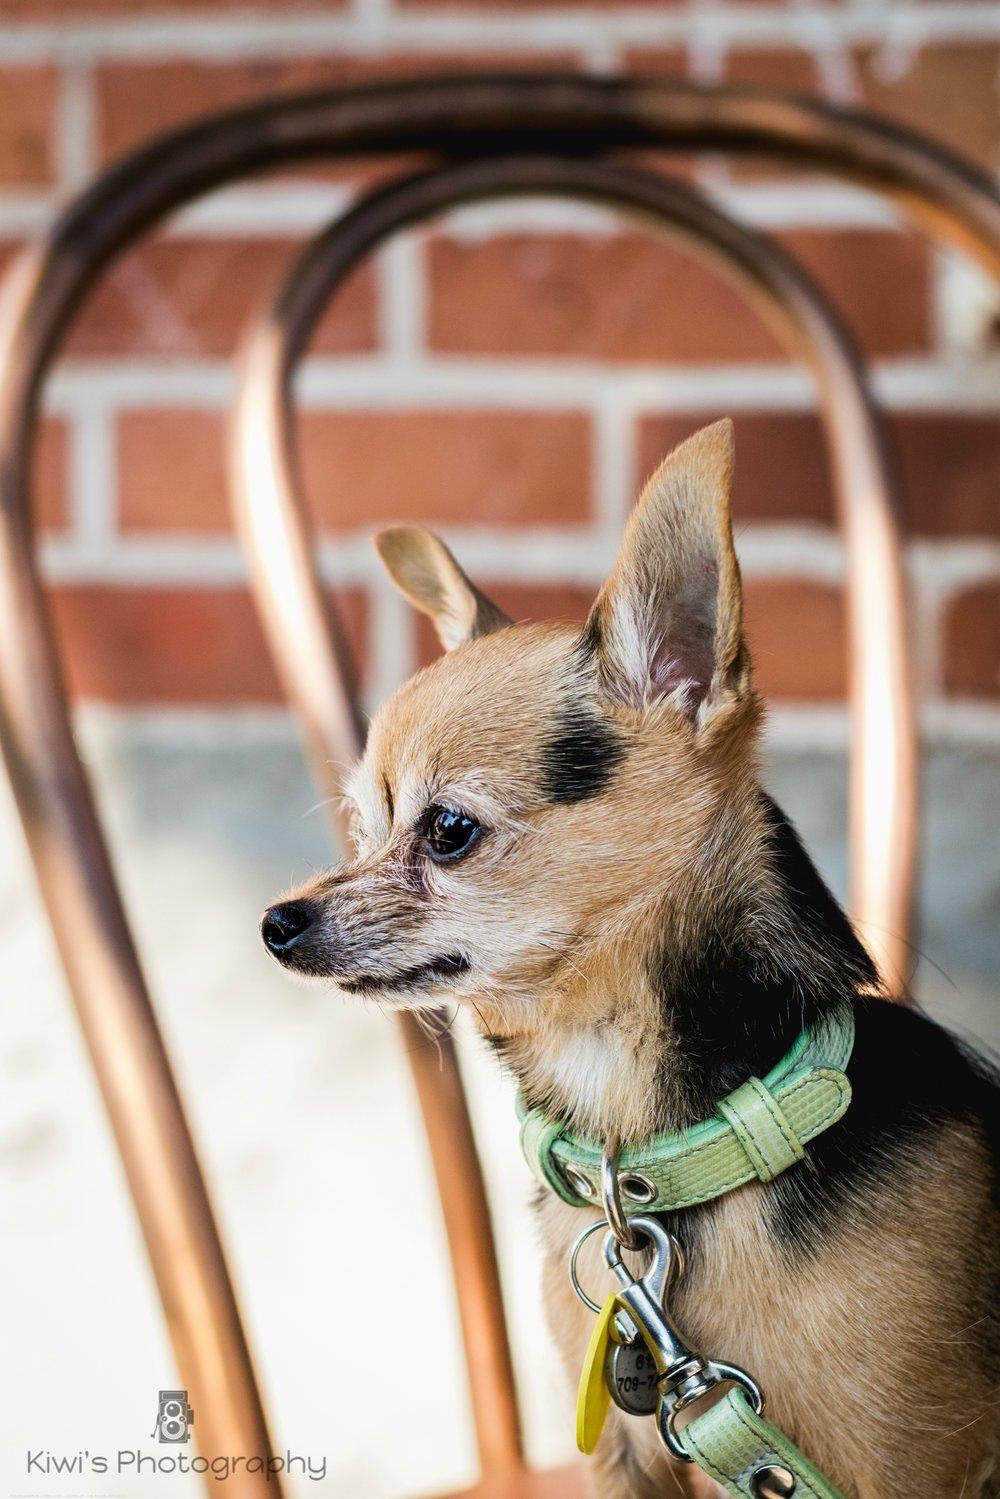 Dog Friendly Cafe in Ottawa: Union Street Kitchen Cafe